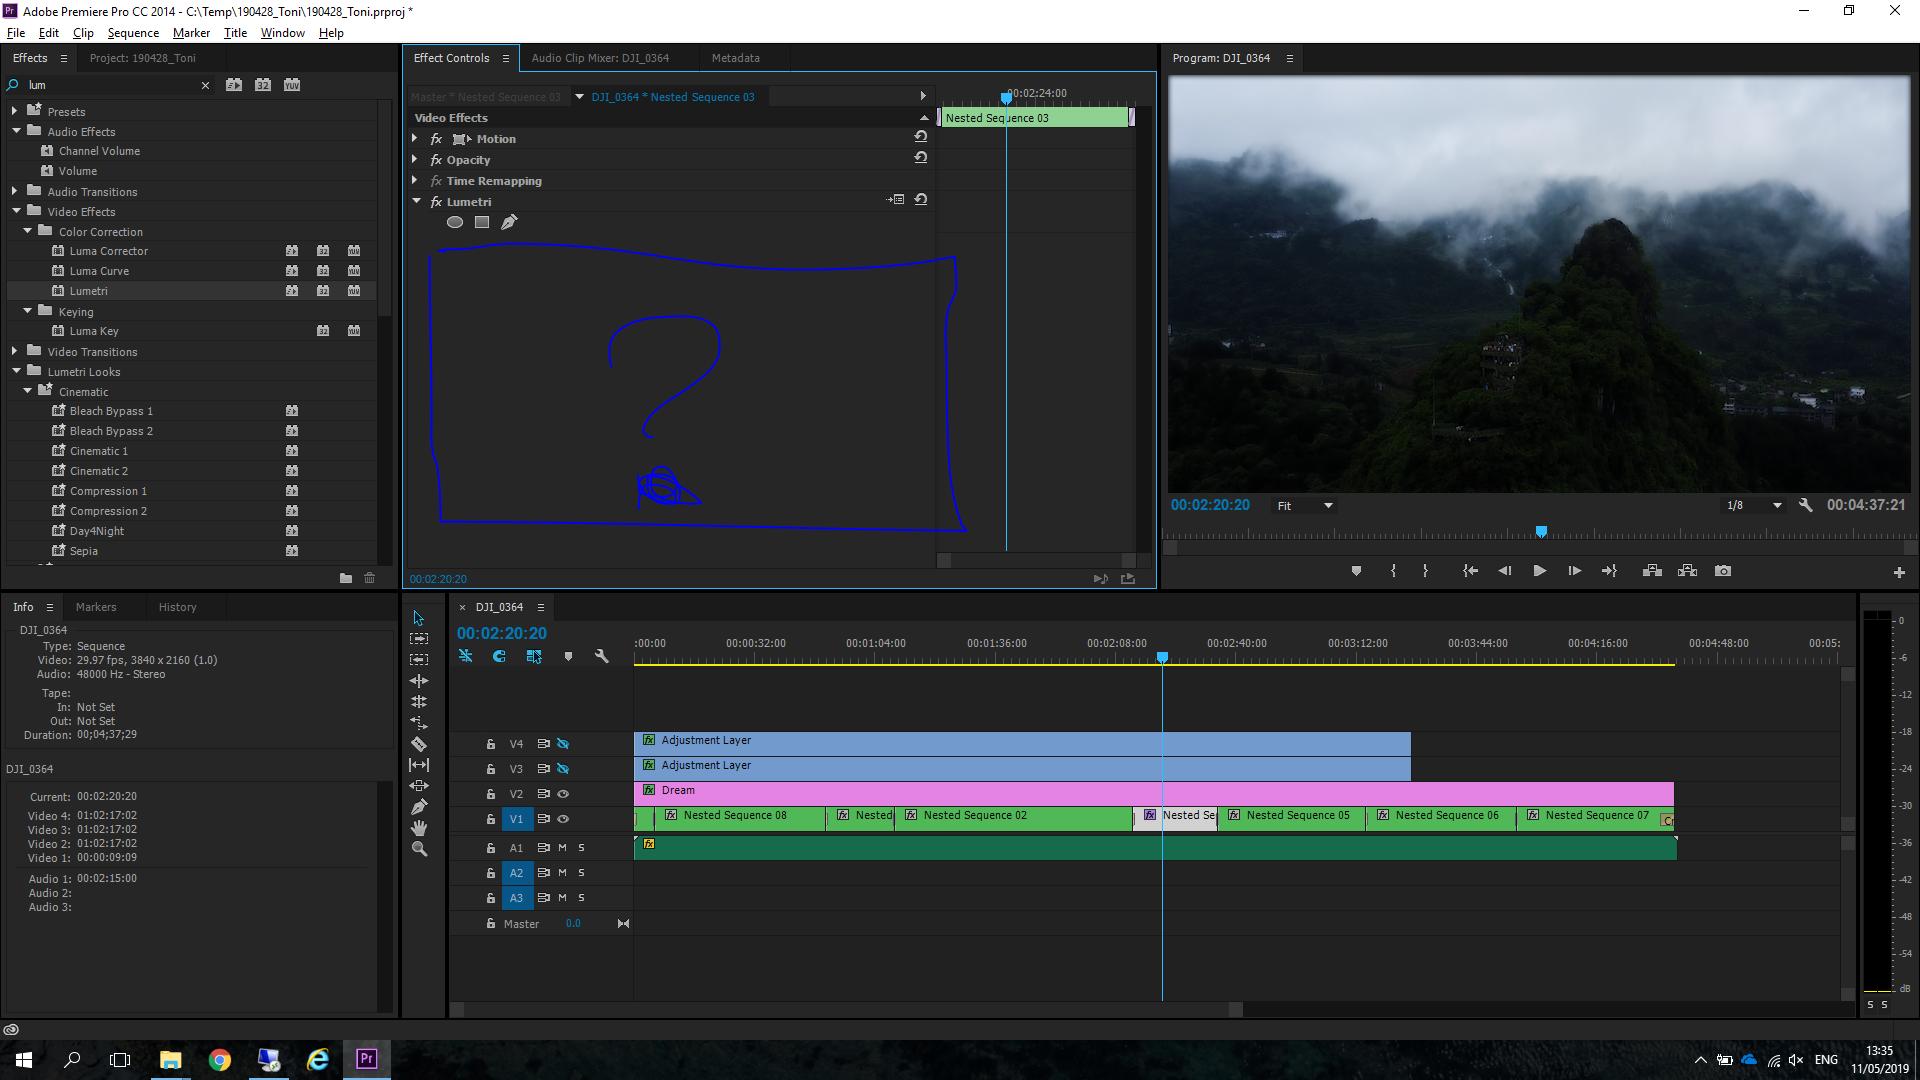 Adobe Premiere Pro Cc 2014 Mac